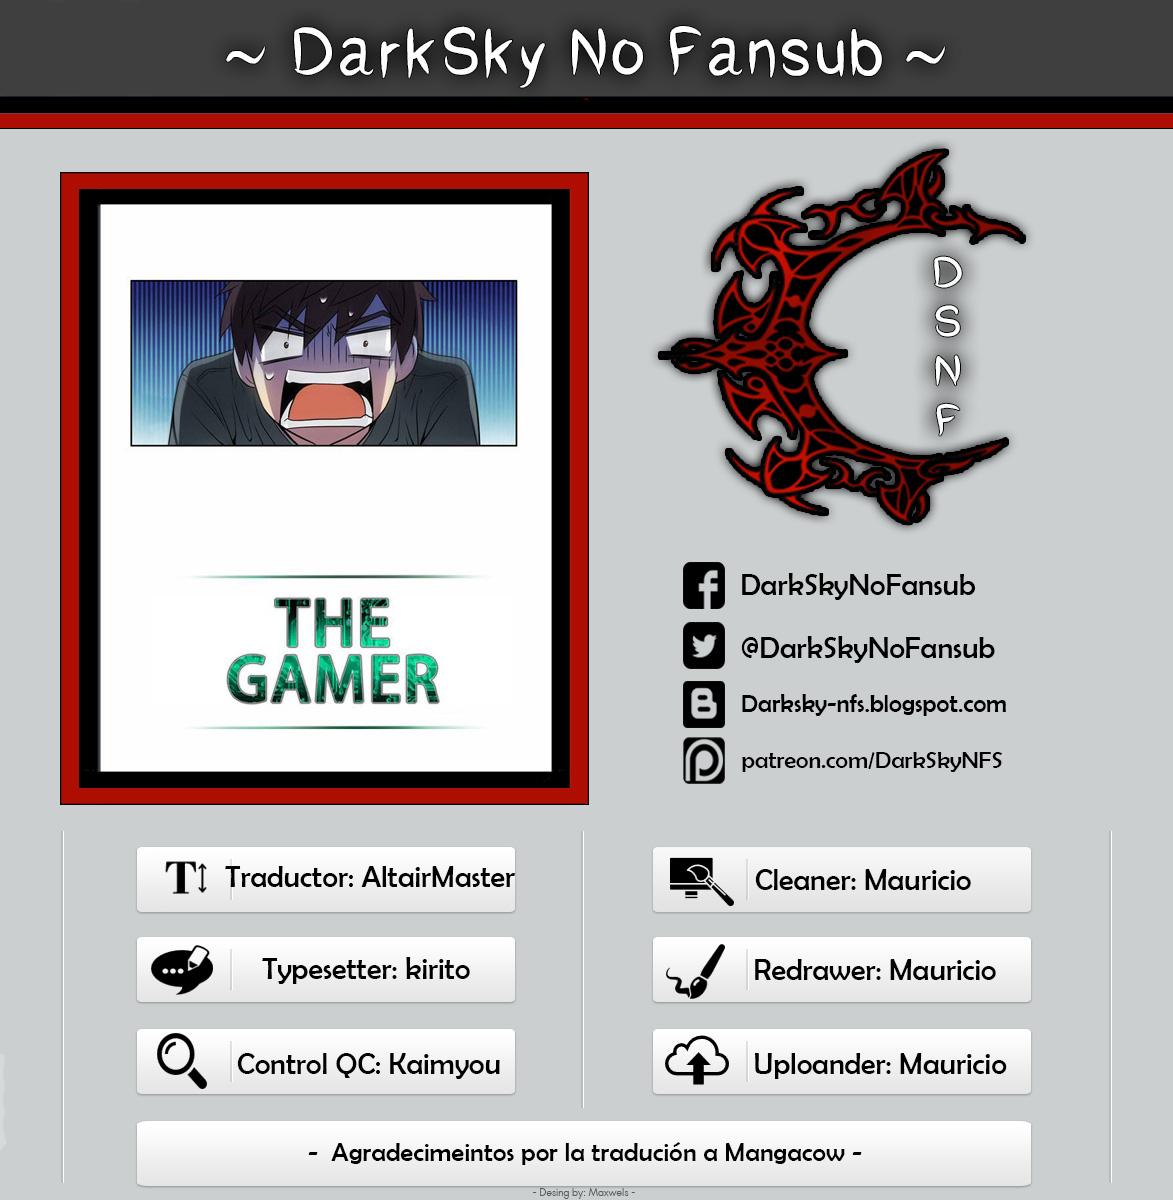 https://c5.ninemanga.com/es_manga/61/1725/415025/9c61812a01e22a961e080418b6fbbf71.jpg Page 1